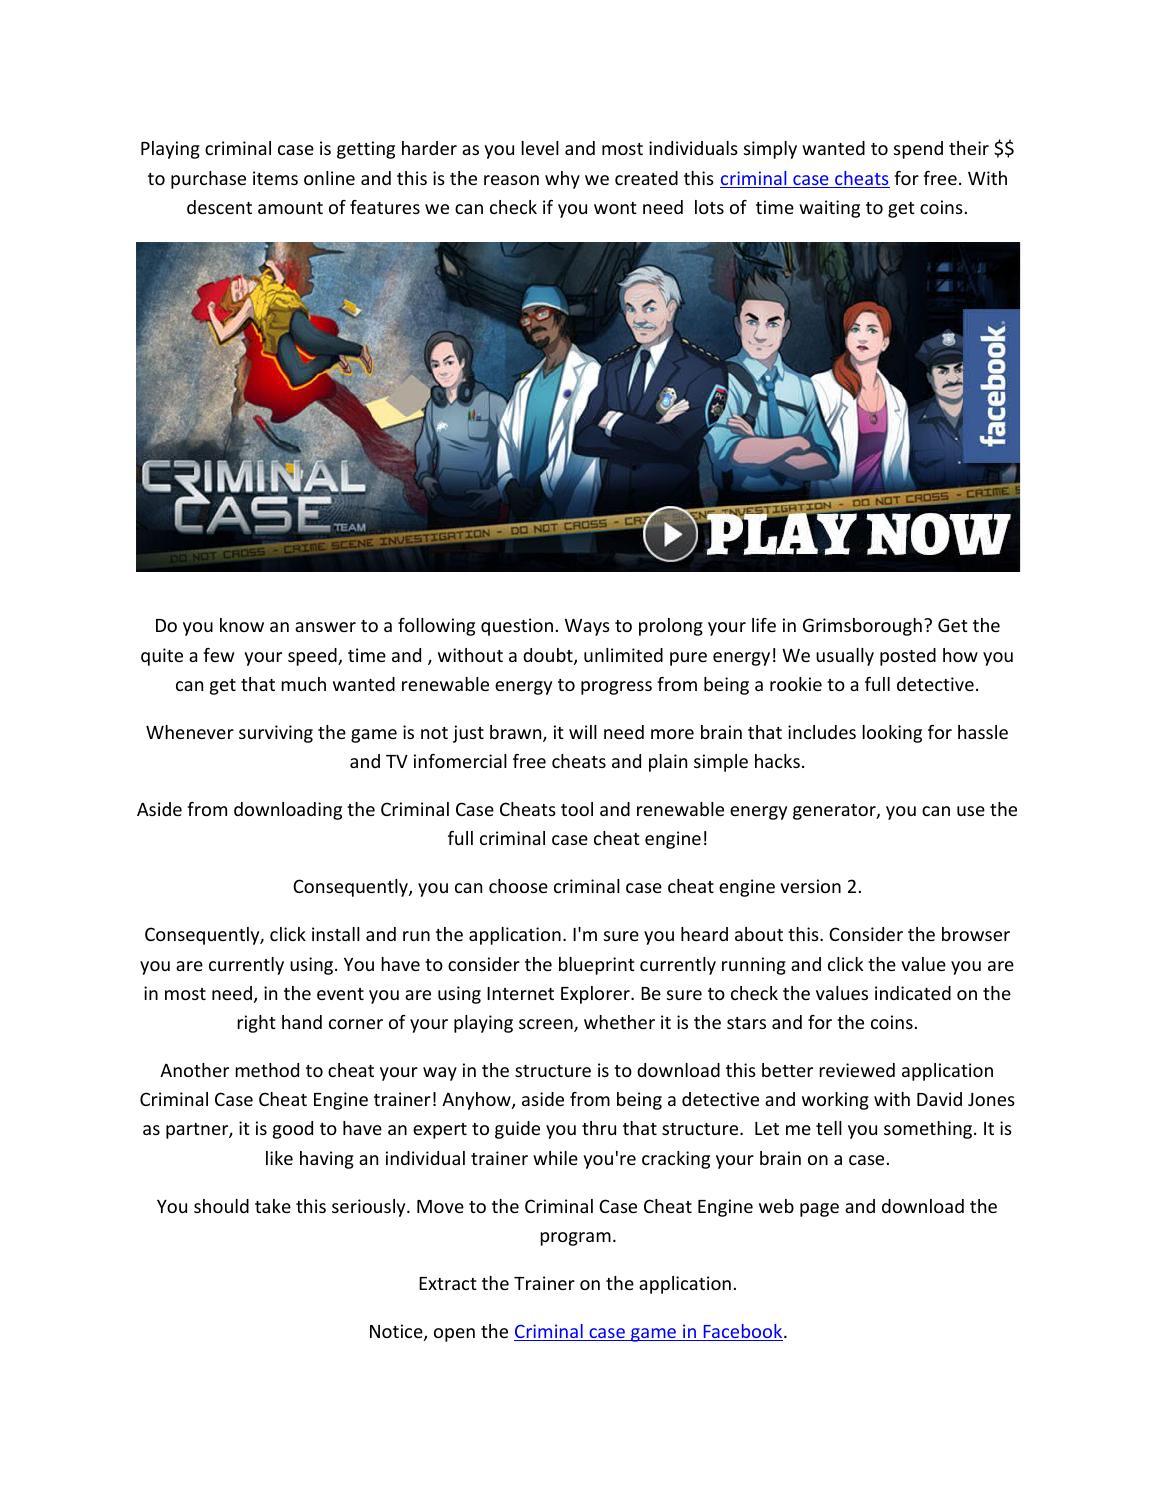 Criminal Case Cheats Review by Sewardas Key - issuu